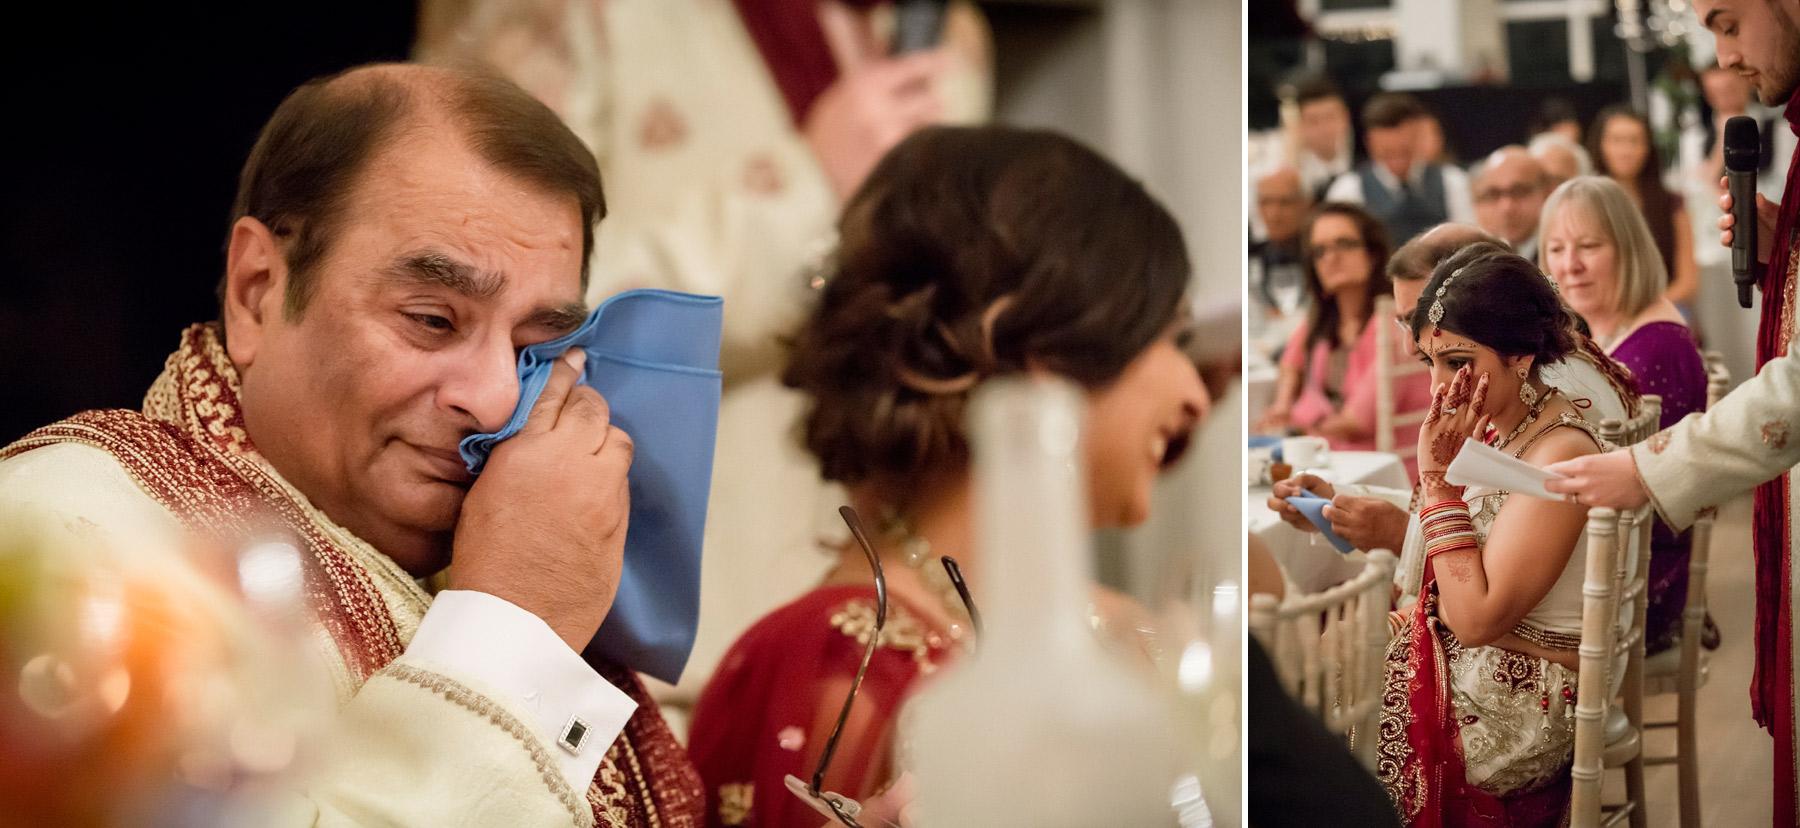 emotions at wedding in scotland